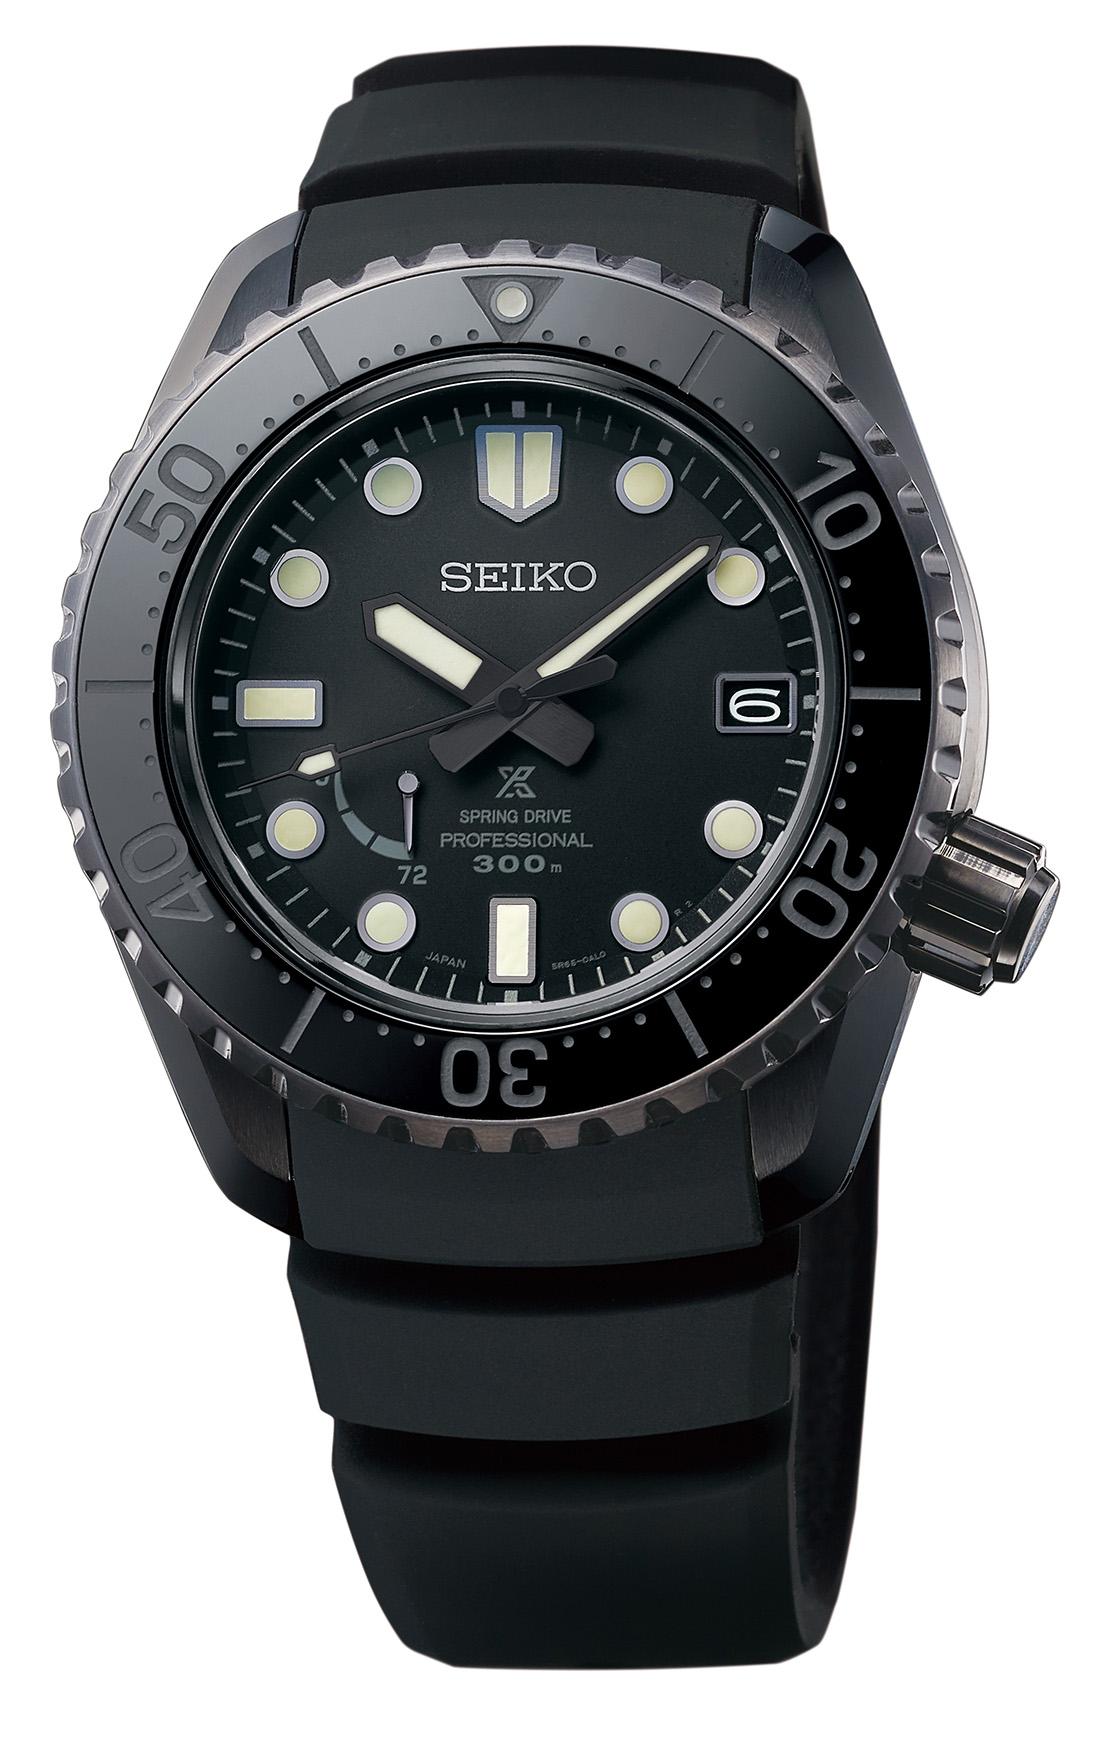 SNR031 / SBDB021 (JDM)